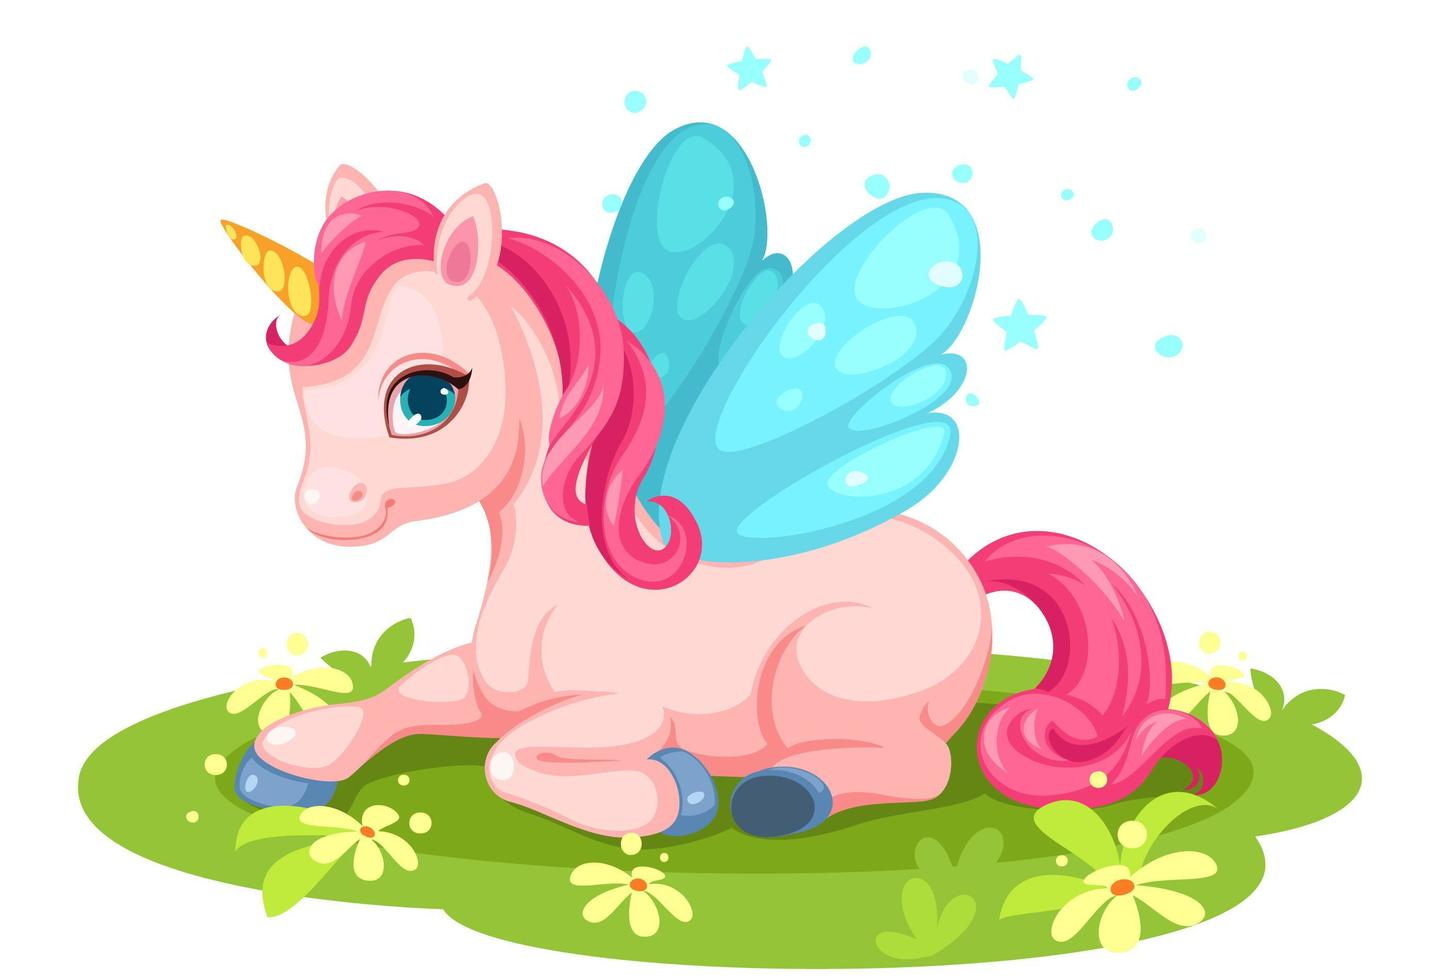 fofo, fantasia, unicórnio rosa bebê vetor